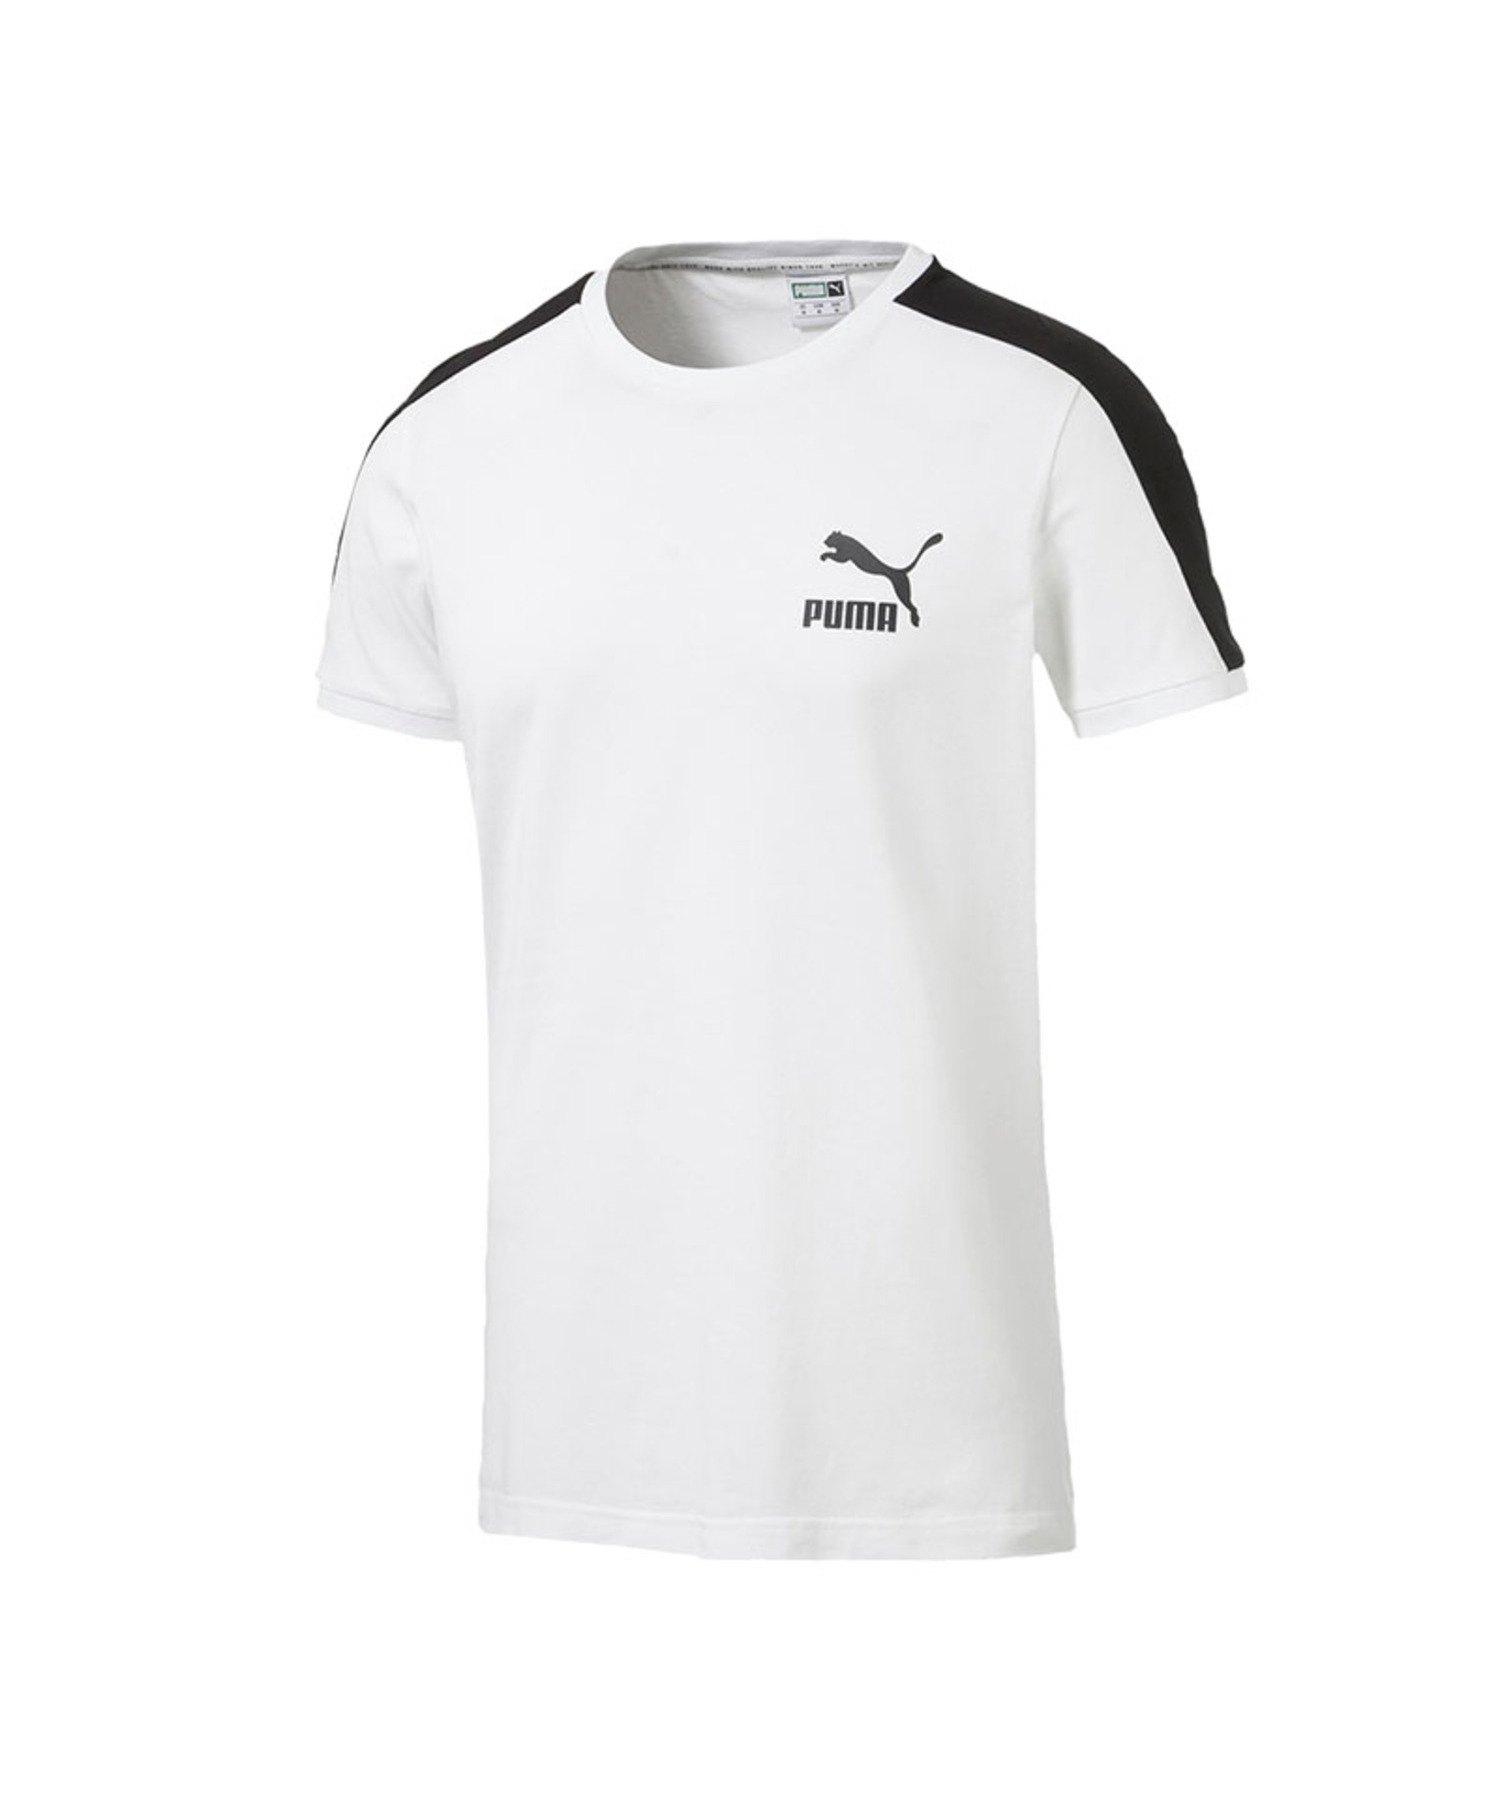 PUMA Iconic T7 T-Shirt Slim Fit Weiss F02 - Weiss